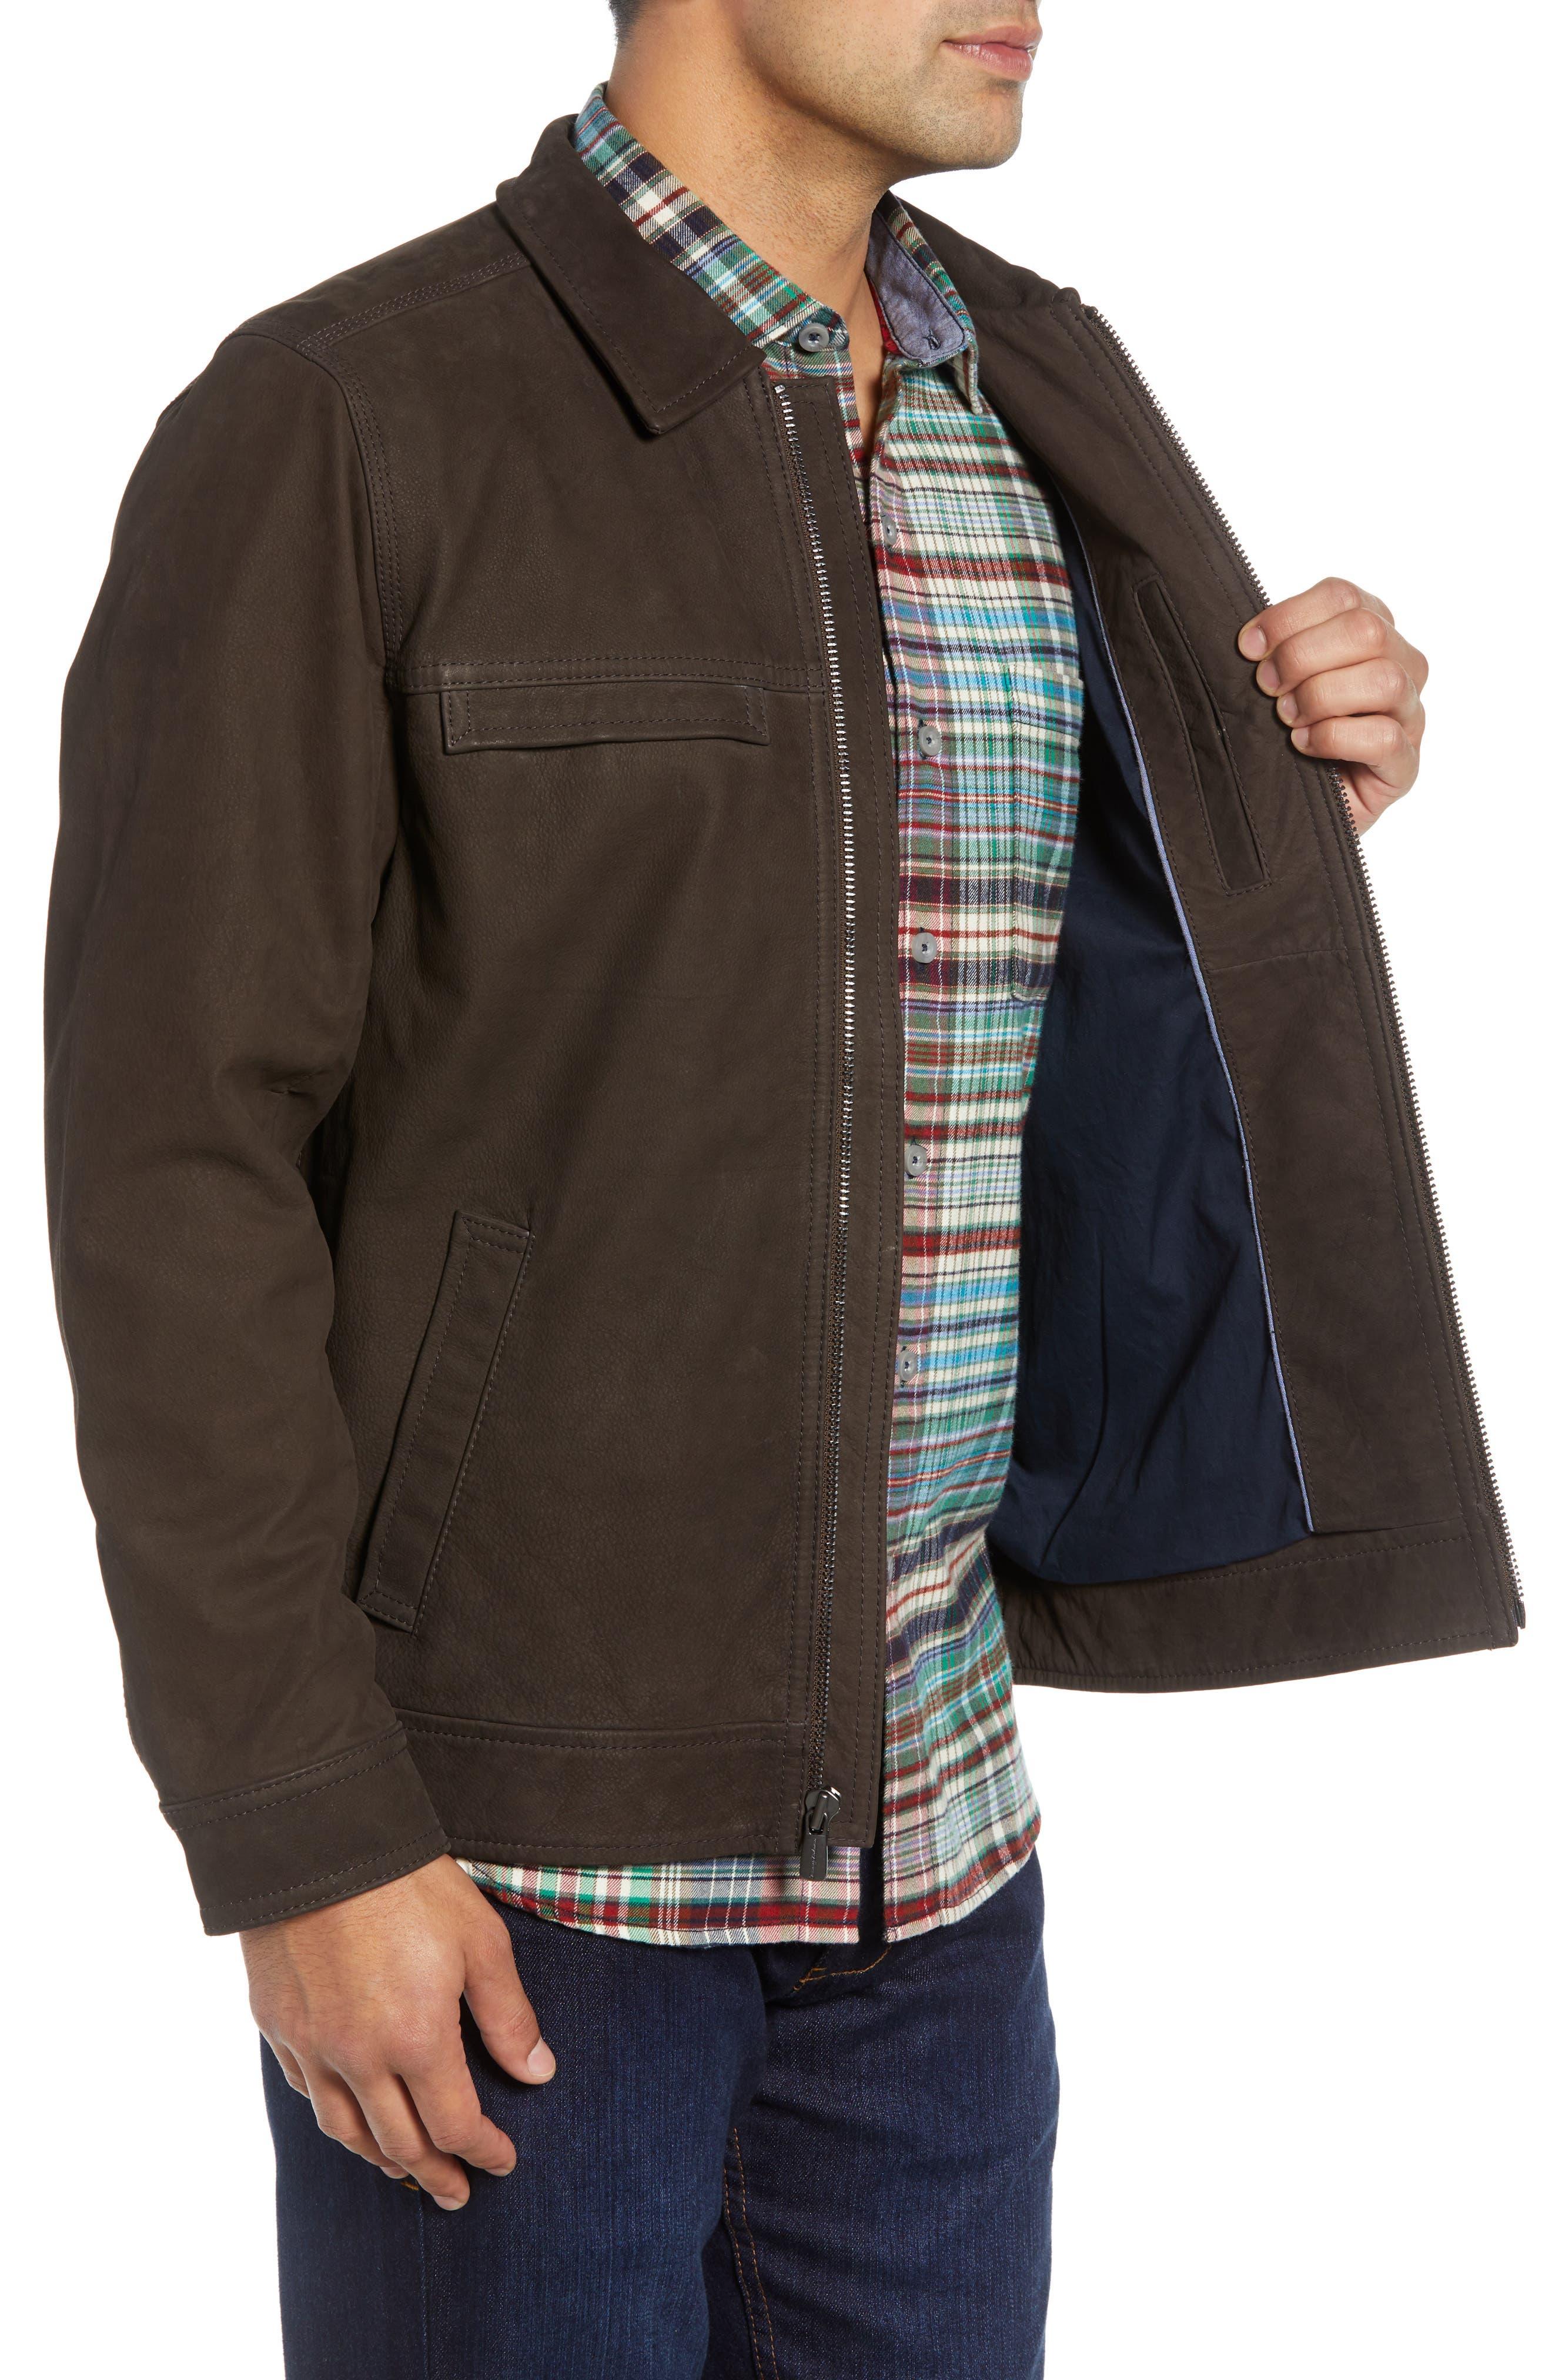 Elliott Bay Leather Jacket,                             Alternate thumbnail 3, color,                             COFFEE